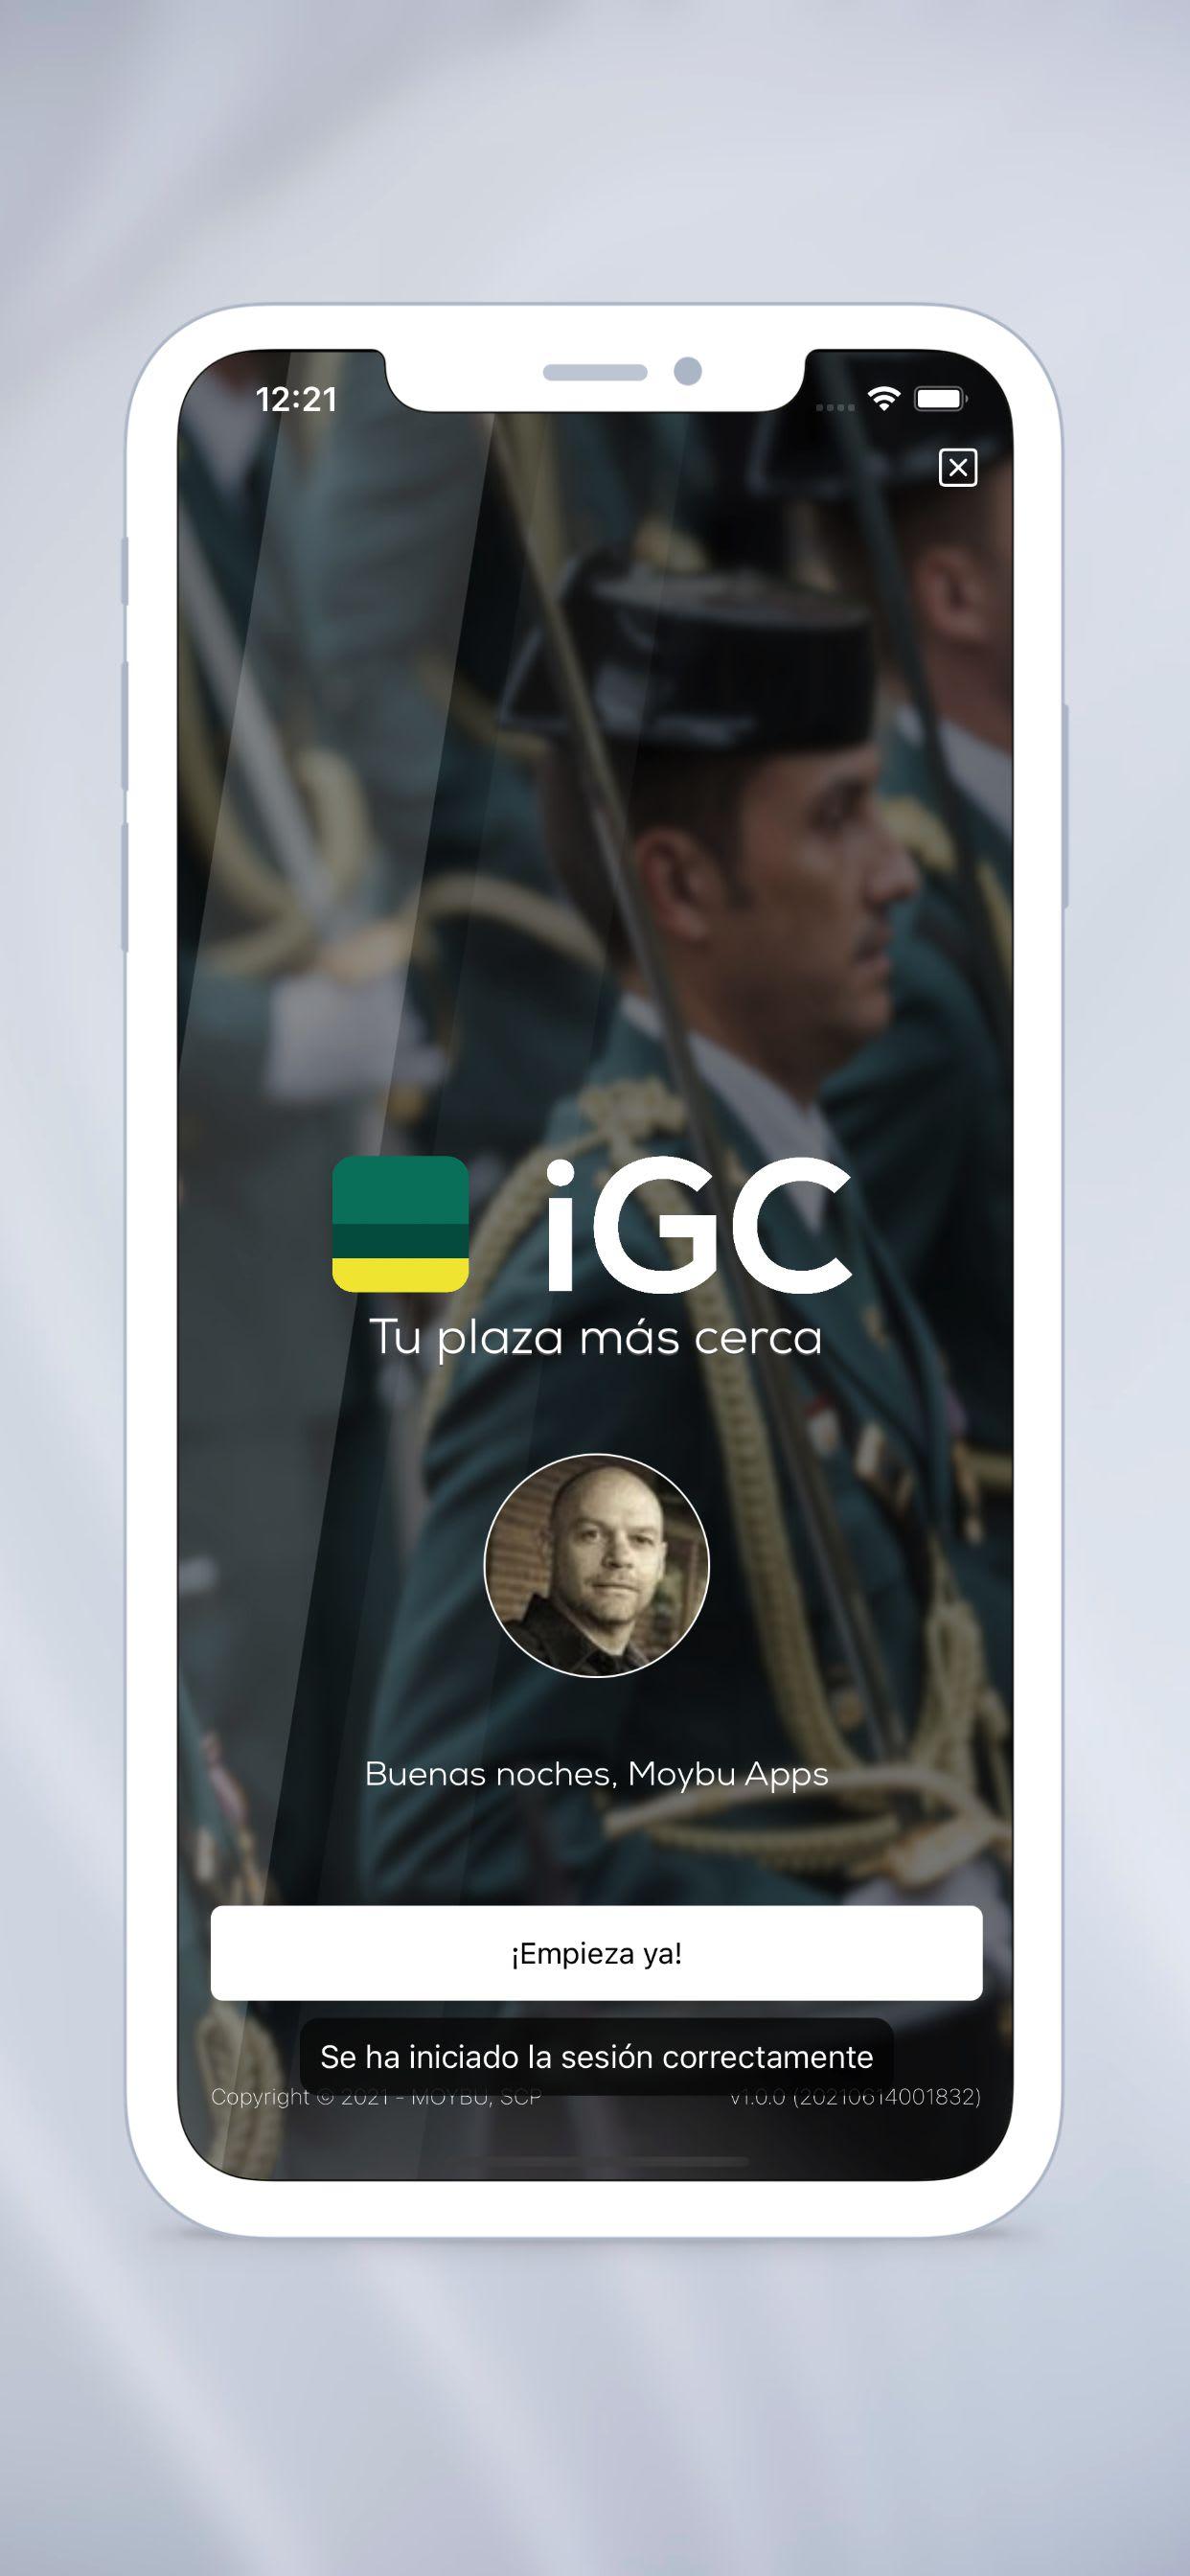 igc screenshot 1